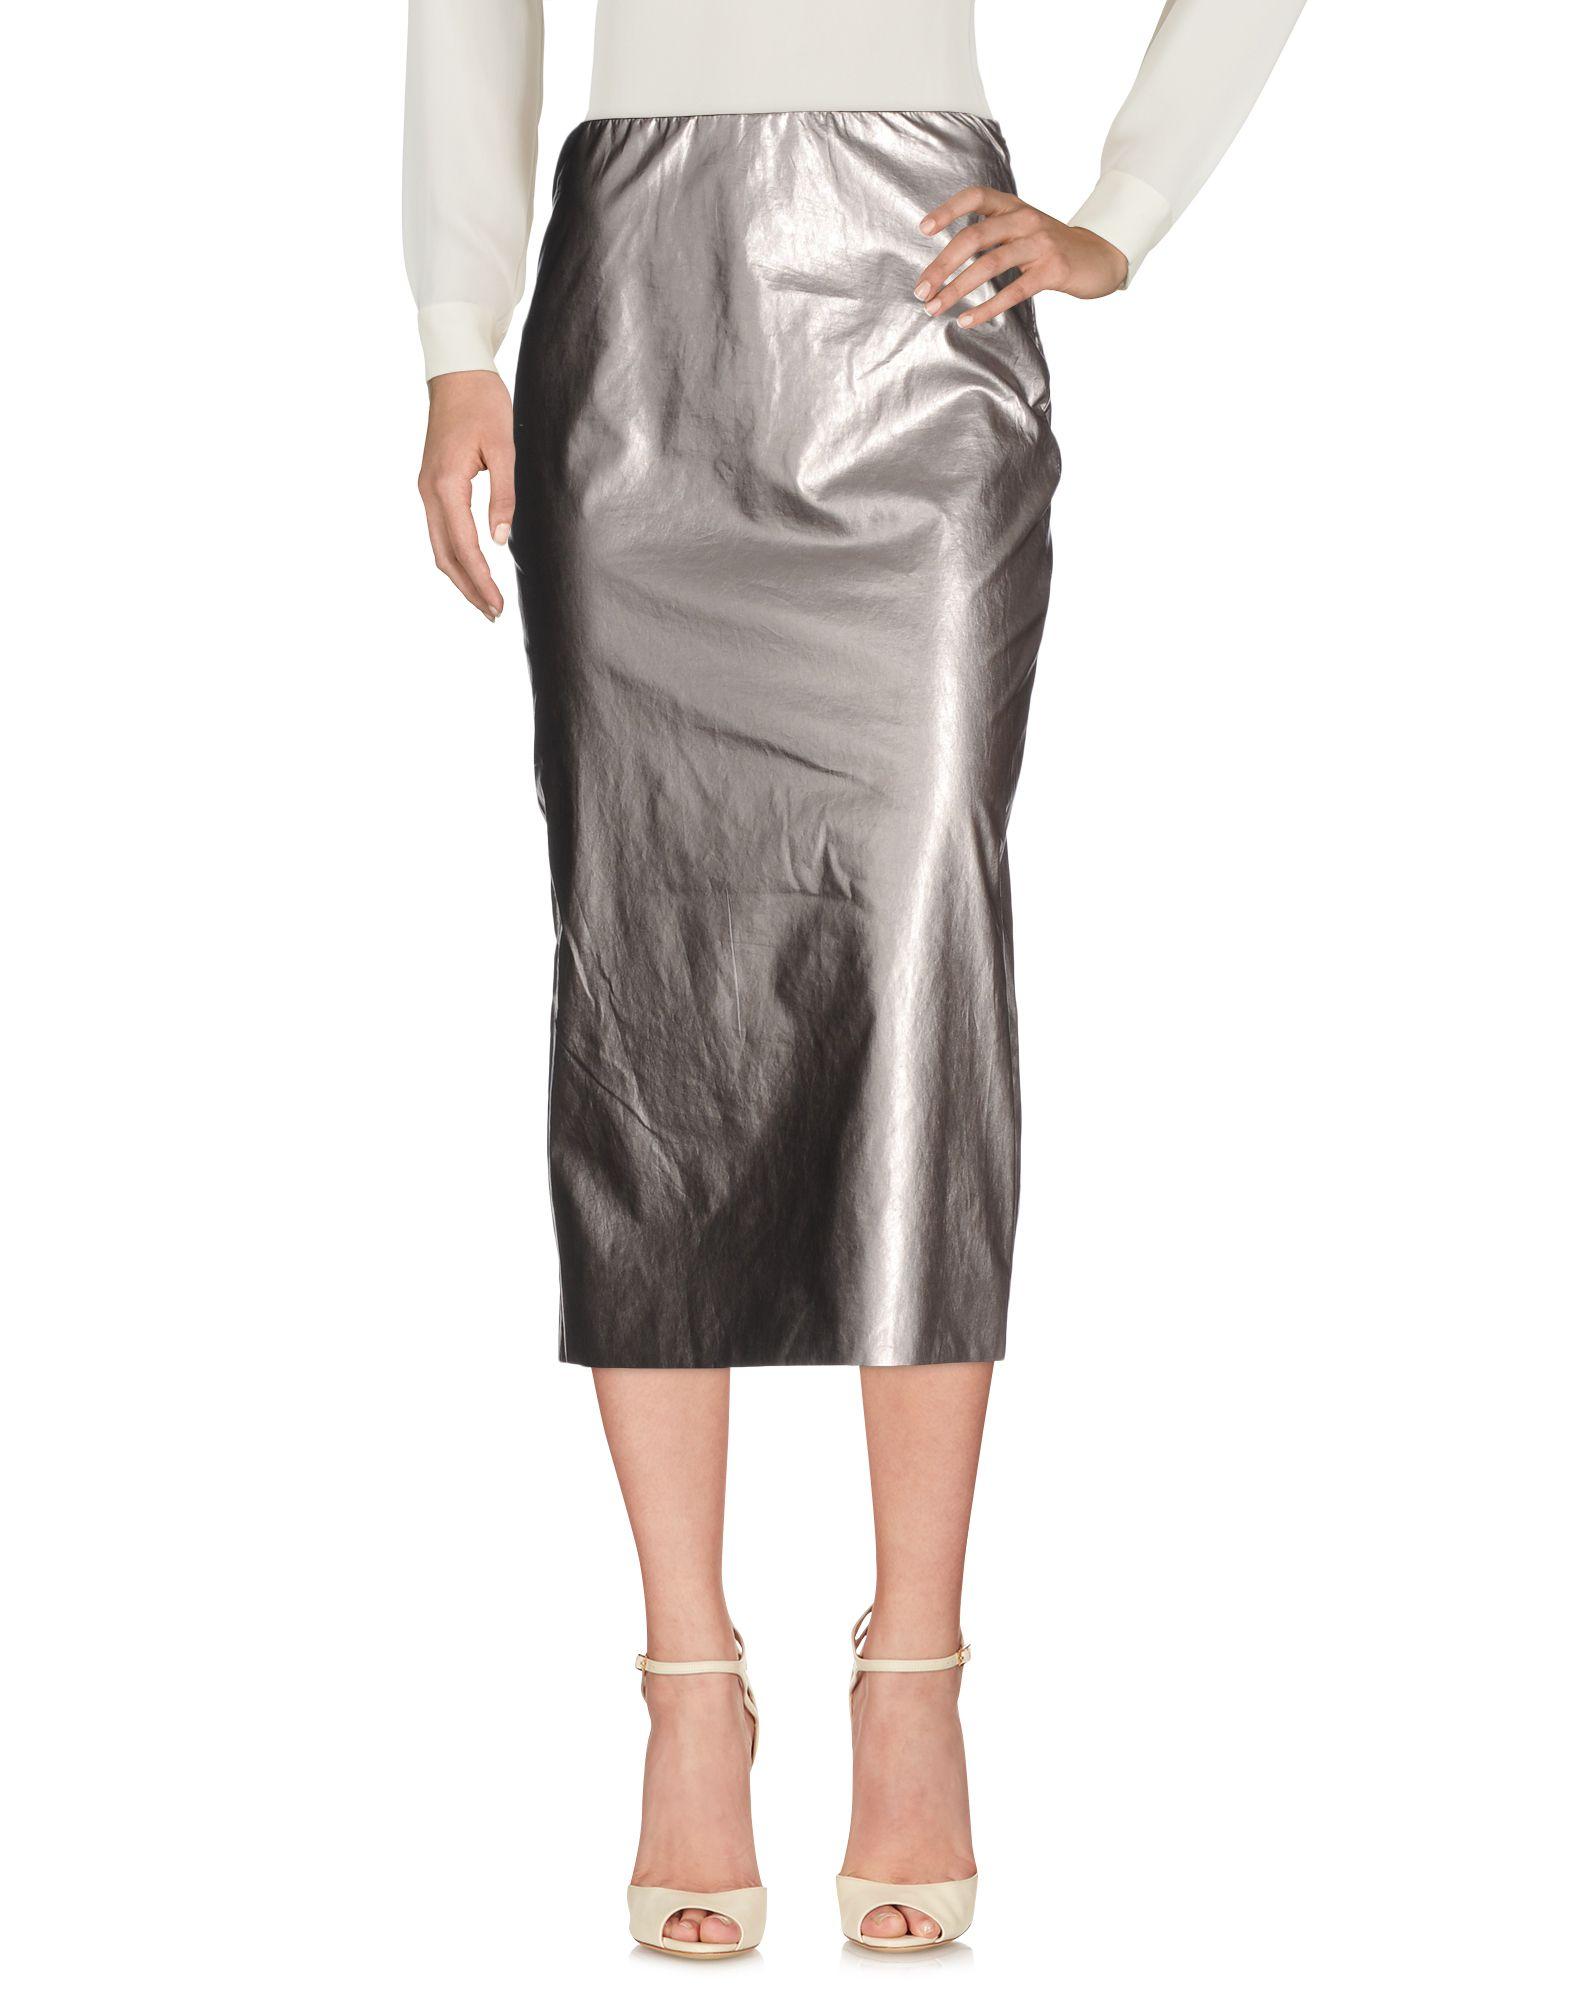 LIVIANA CONTI Юбка длиной 3/4 mon lalhou юбка длиной 3 4